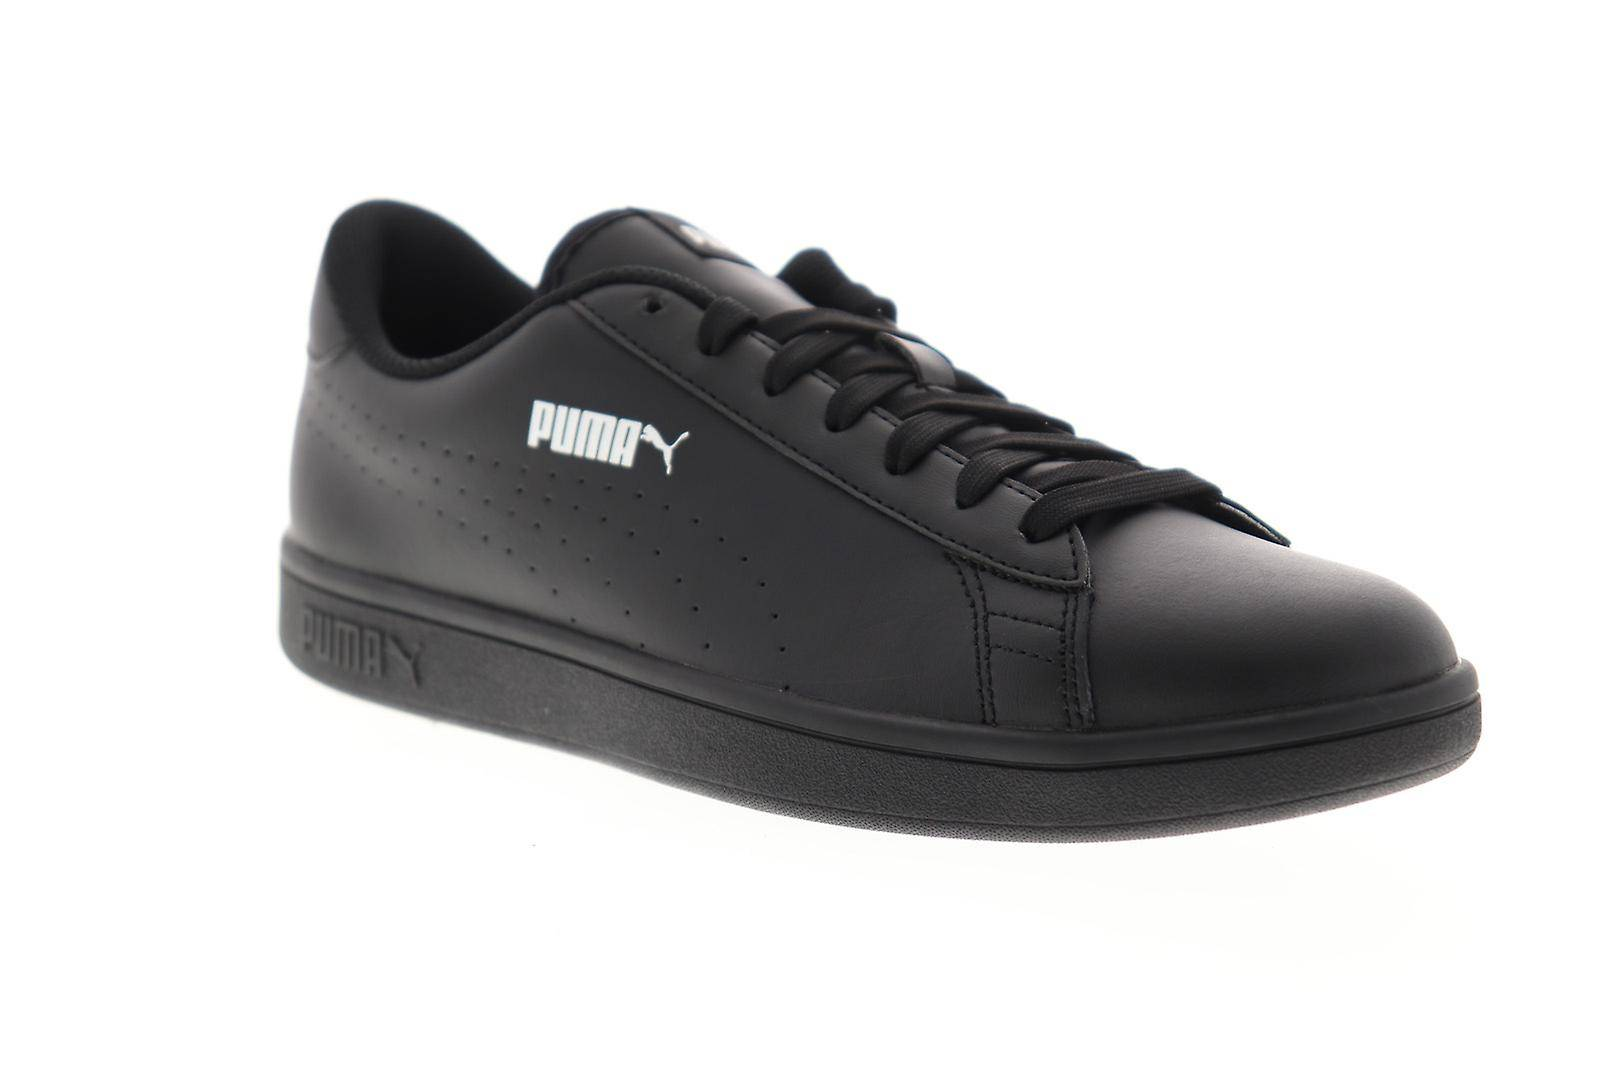 Puma Smash V2 L Perf Mens Noir Synthétique Low Top Sneakers Chaussures